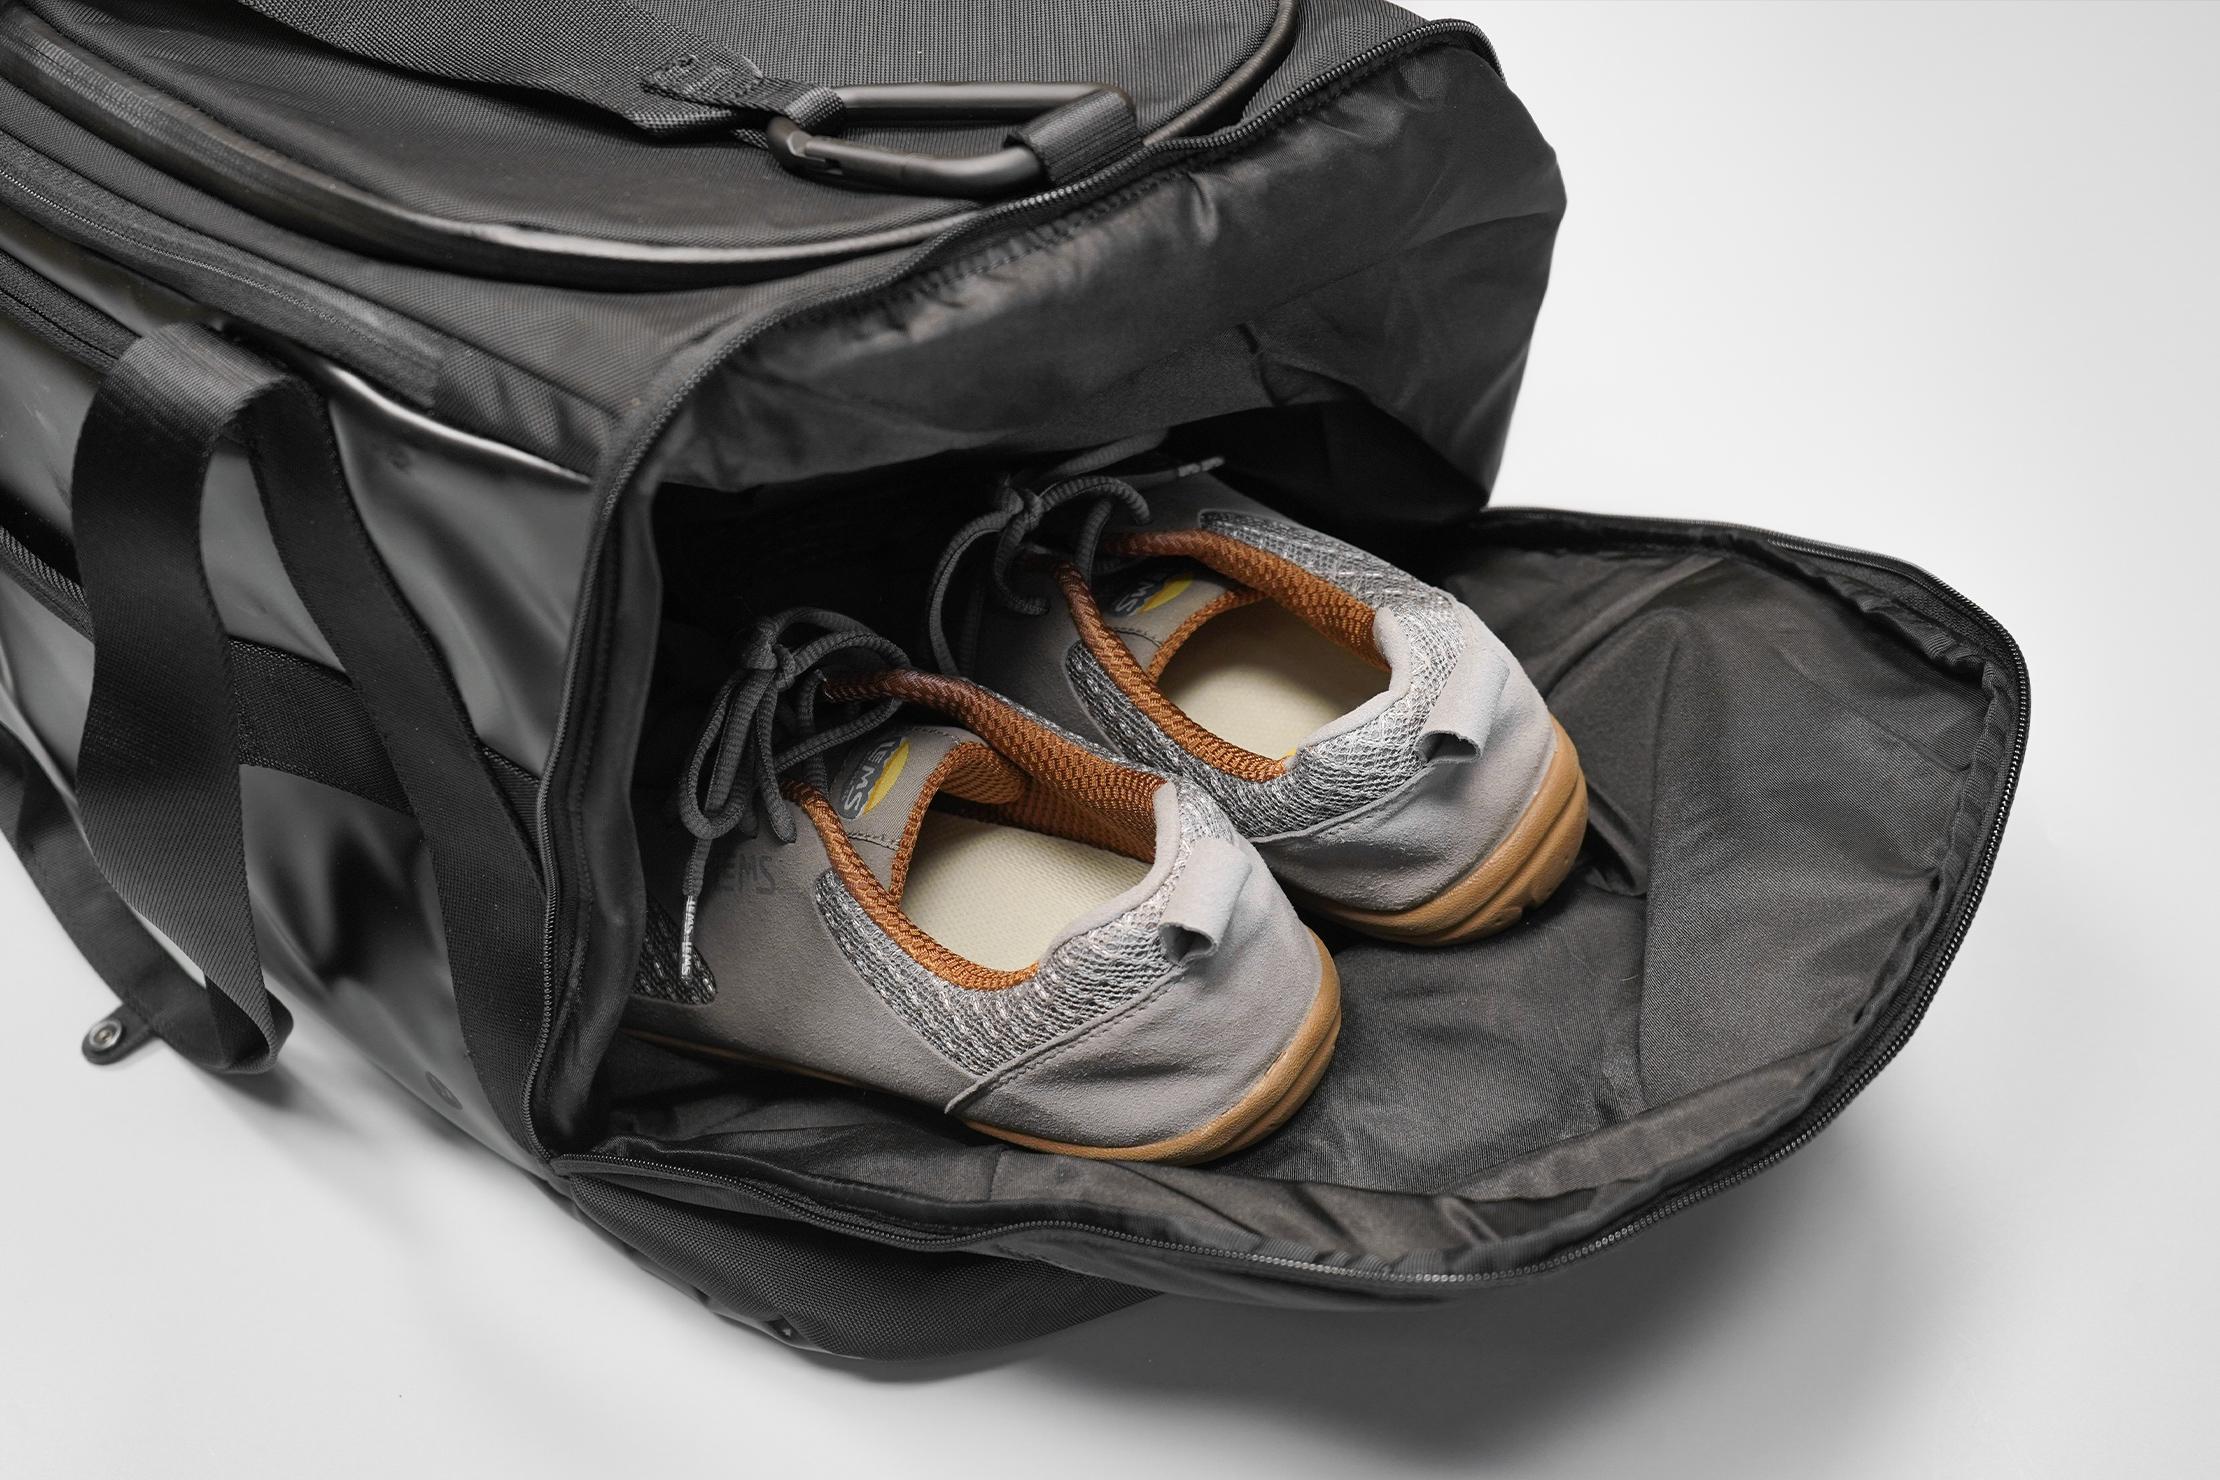 lululemon More Miles Duffle Shoe Compartment